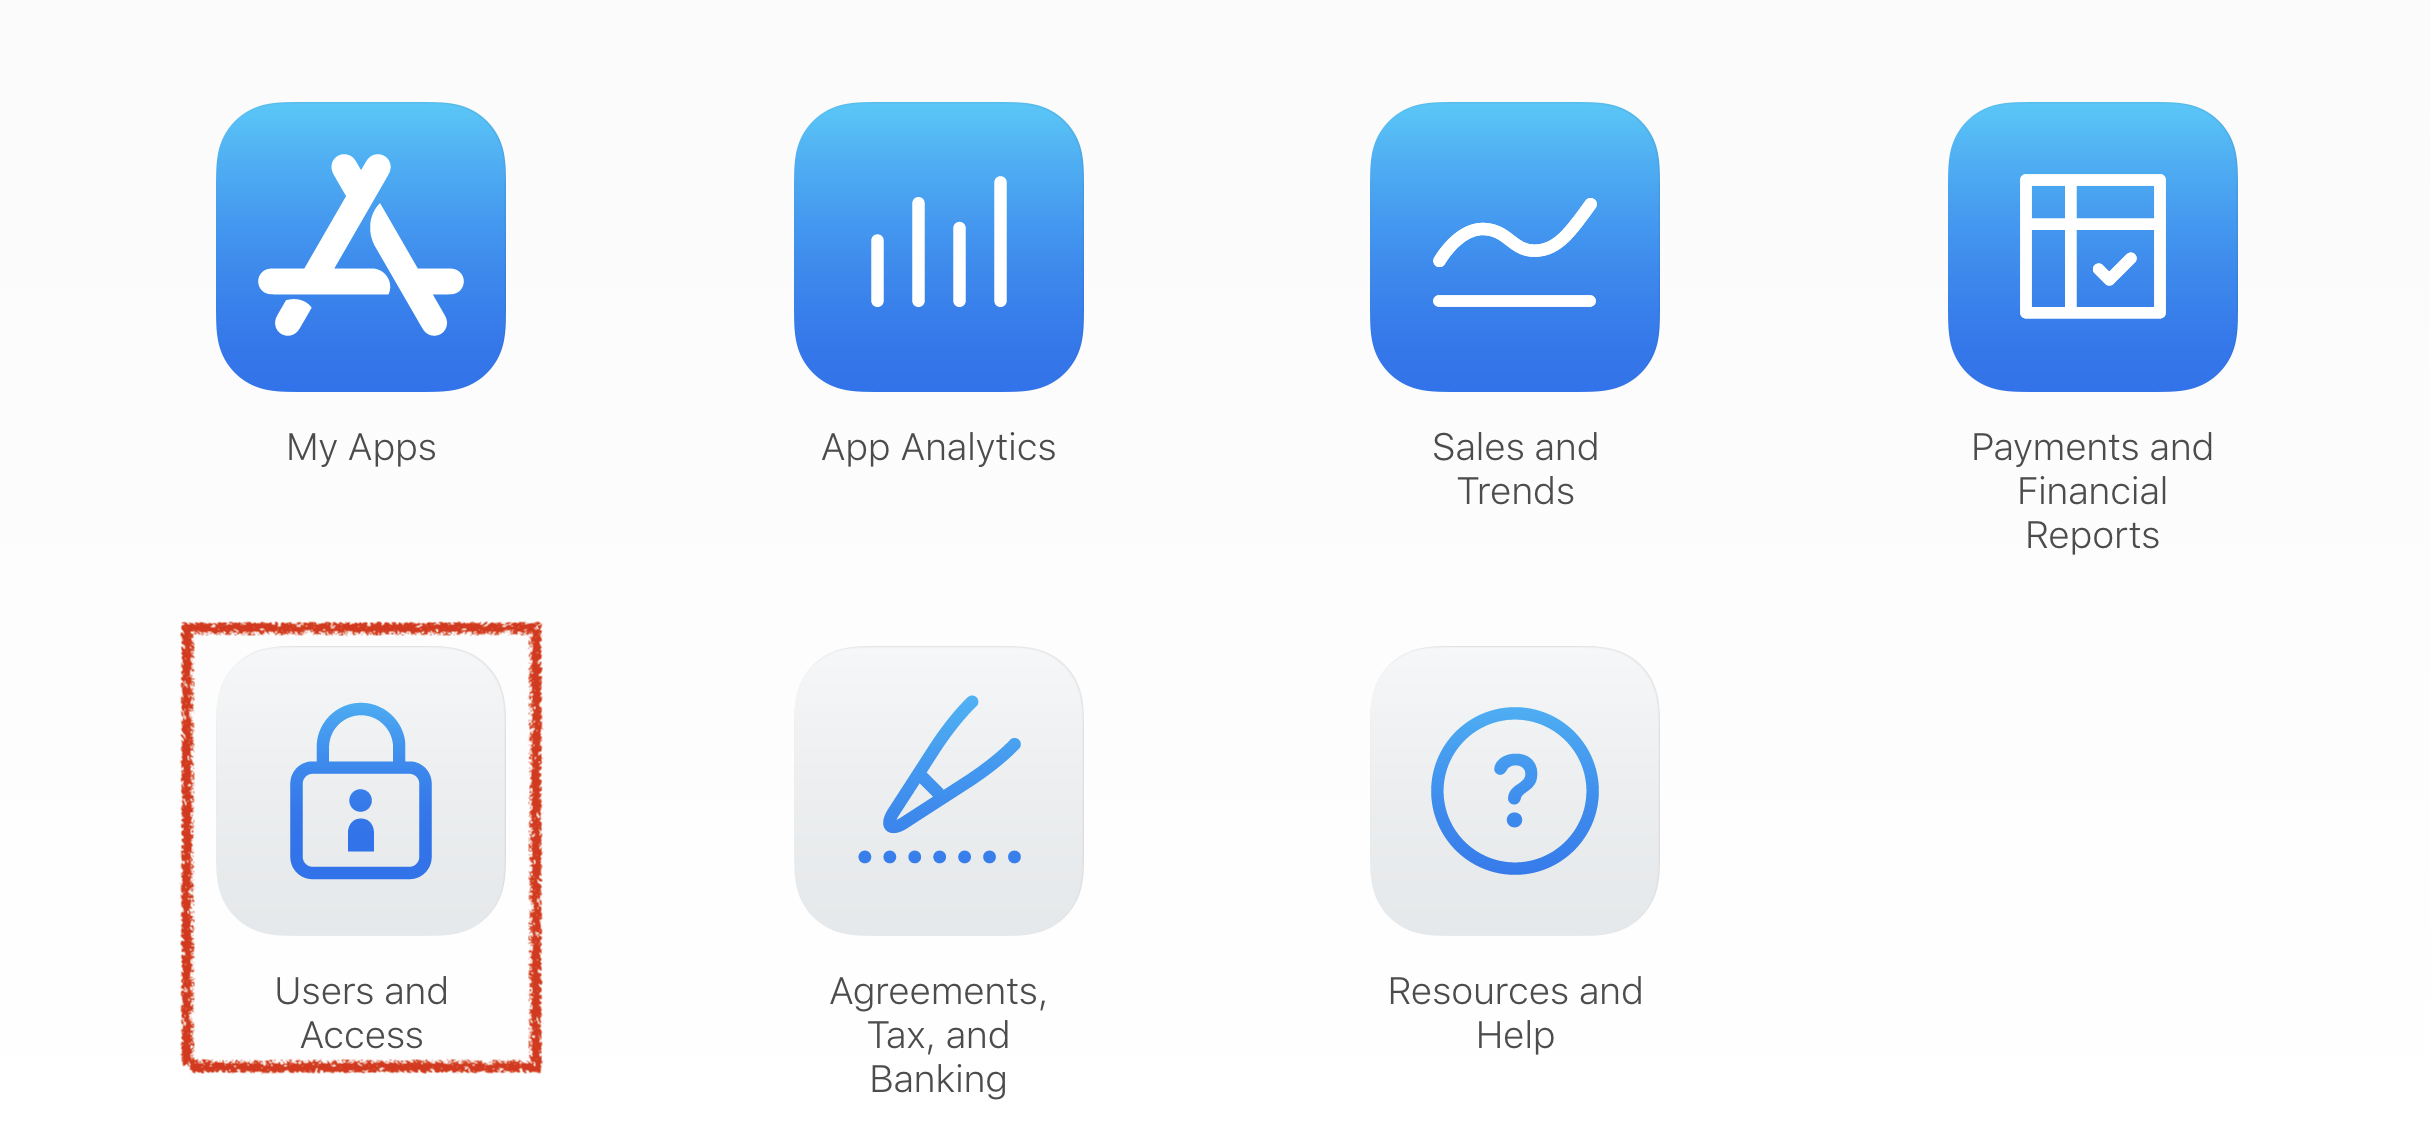 Screenshot of App Store Connect navigation UI highlighting where to create sandbox accounts